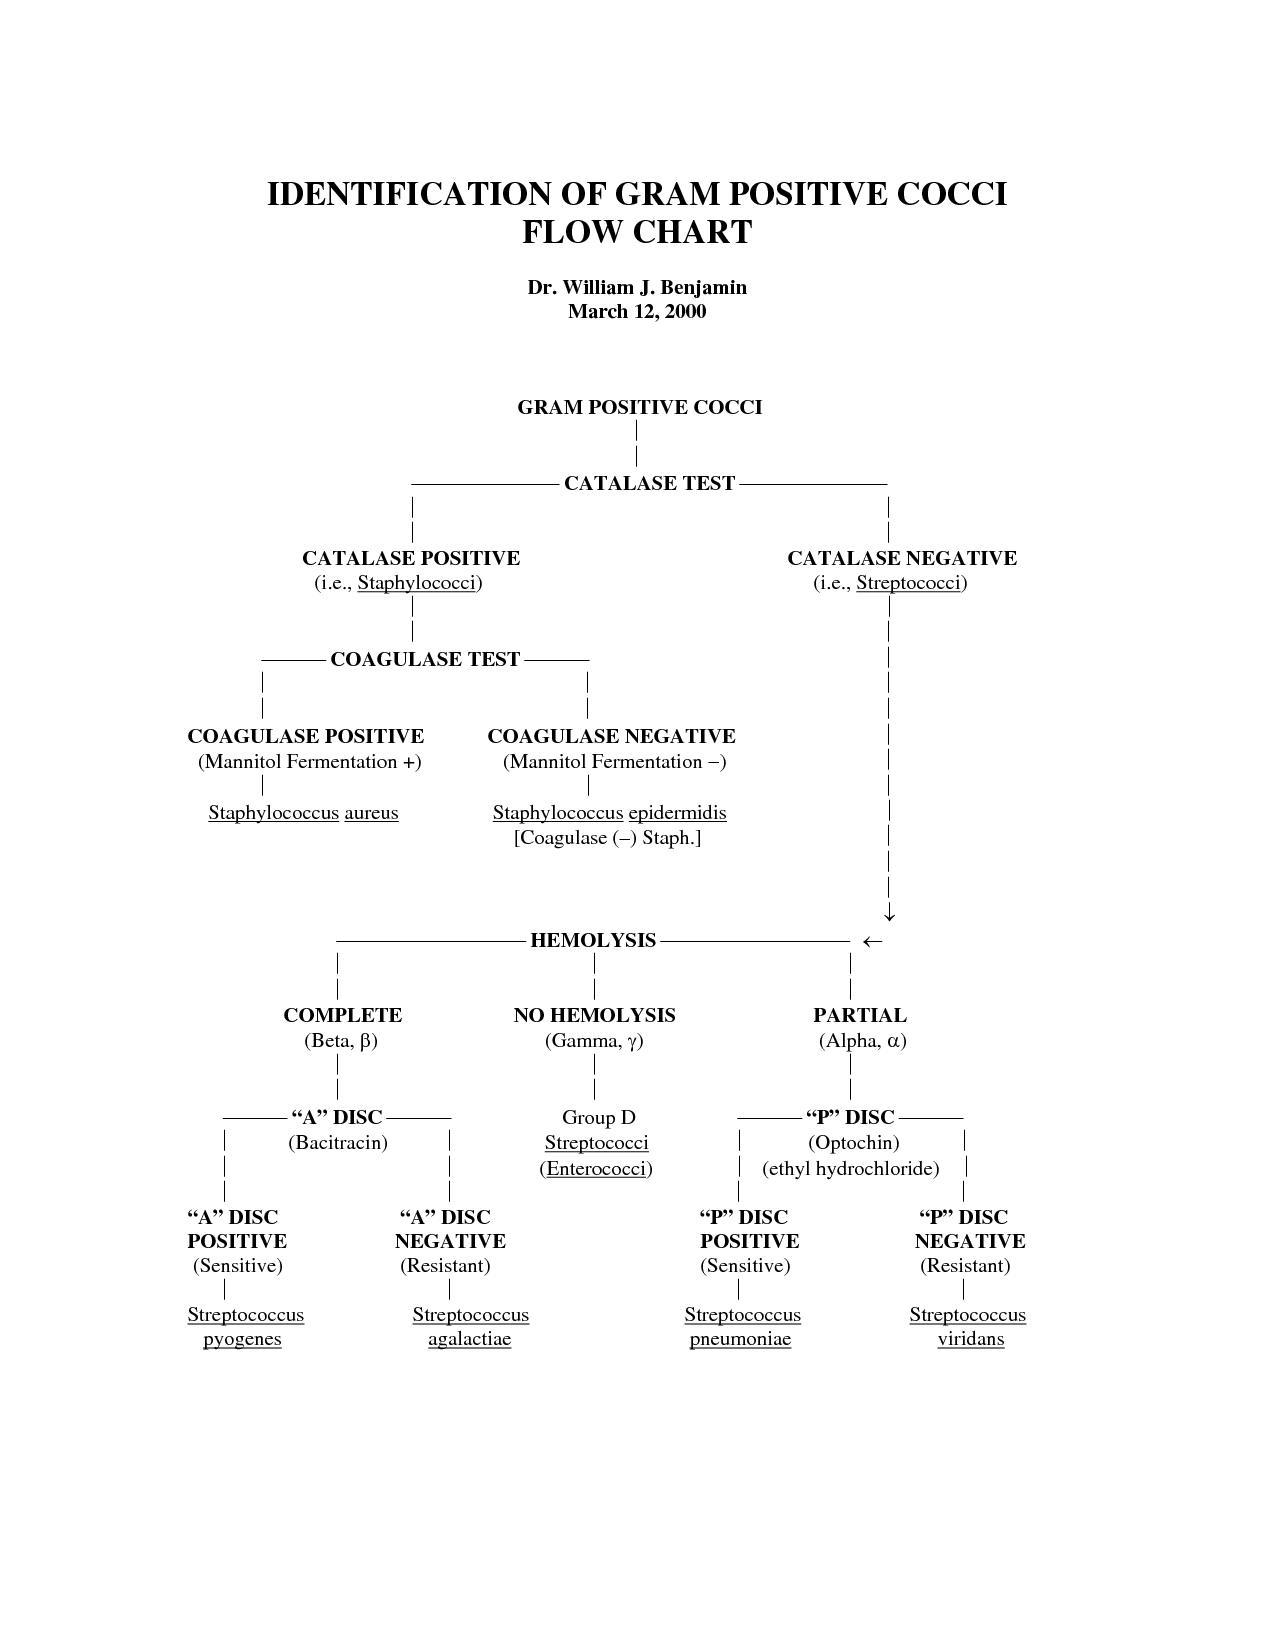 Gram negative bacilli flowchart identification of gram positive gram negative bacilli flowchart identification of gram positive cocci flow chart nvjuhfo Images